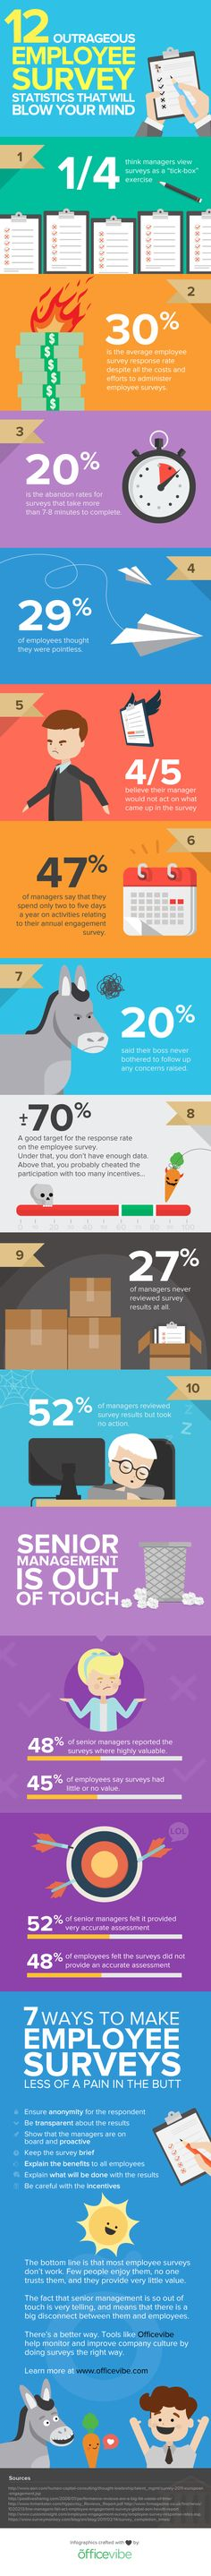 Best 25+ Employee satisfaction survey ideas on Pinterest Date 25 - employee survey template